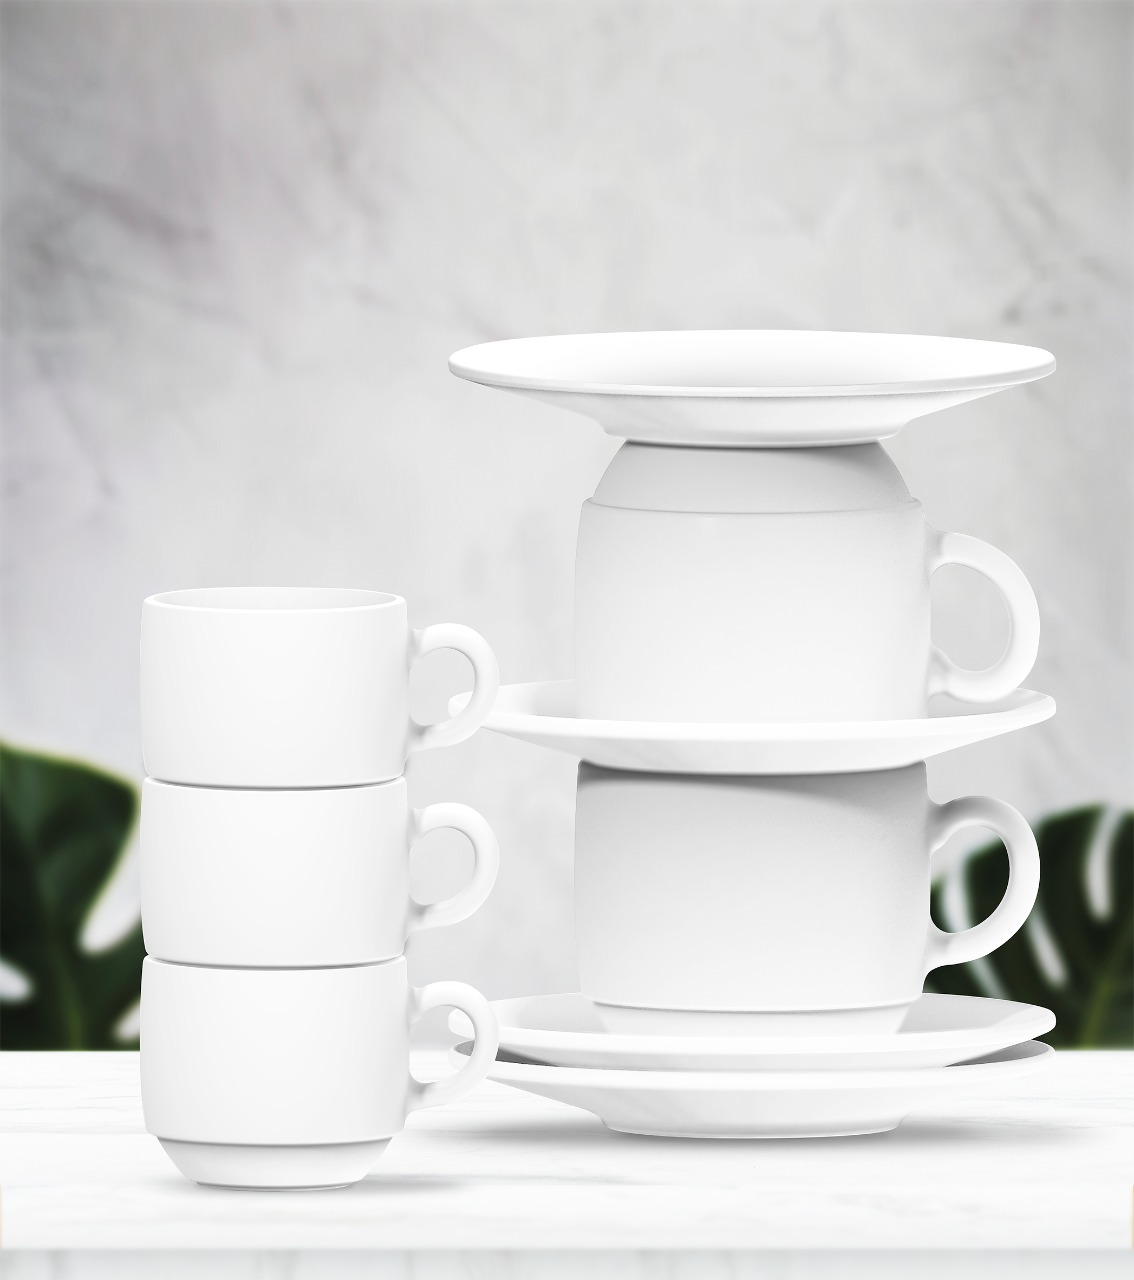 Xícara Chá Opaline com pires  240ml